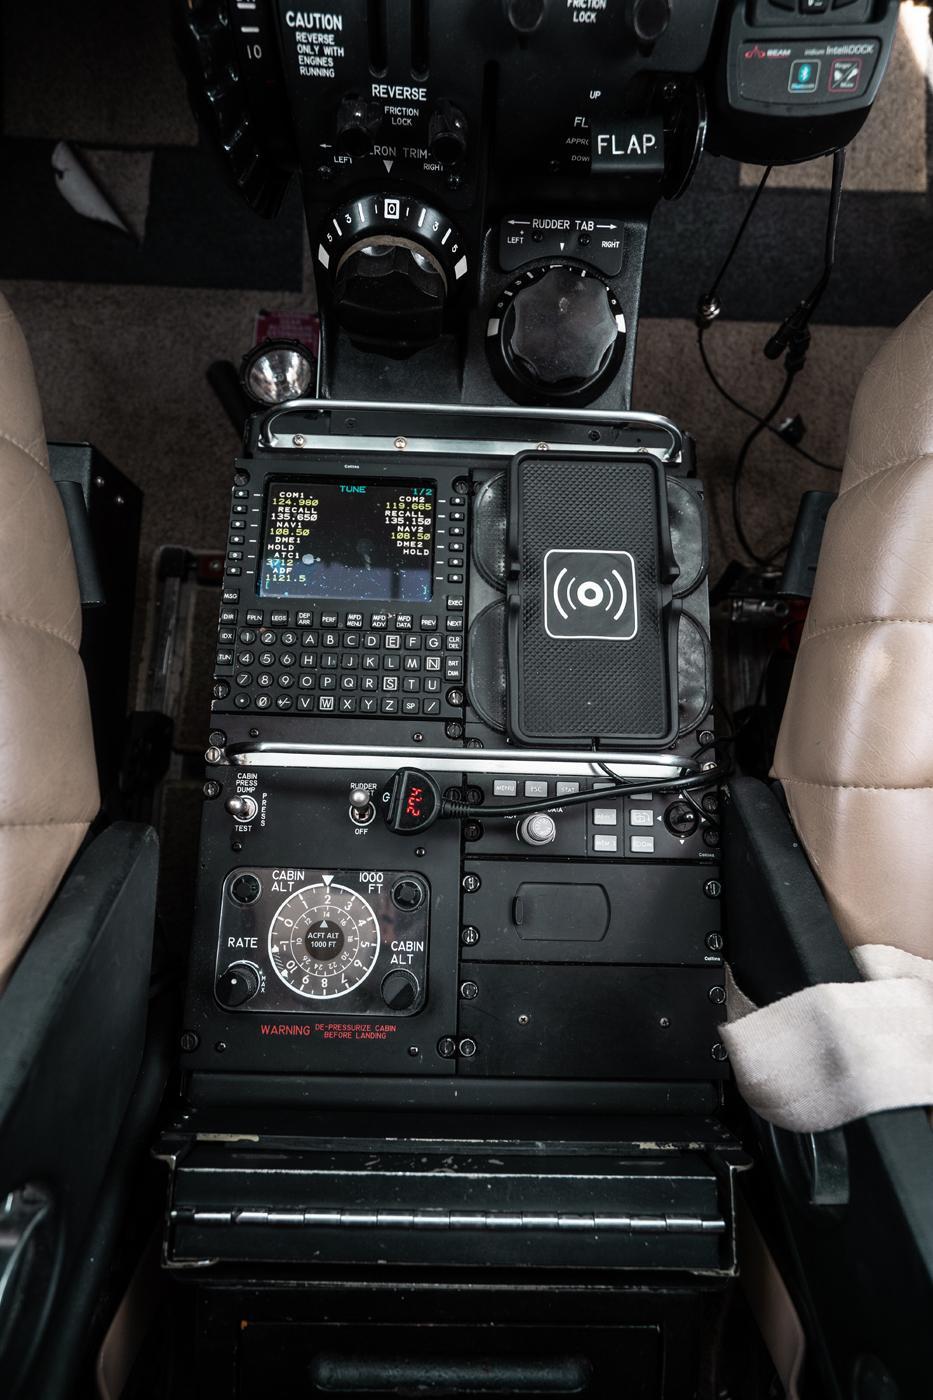 2010 Beech King Air C90 GTx Photo 6